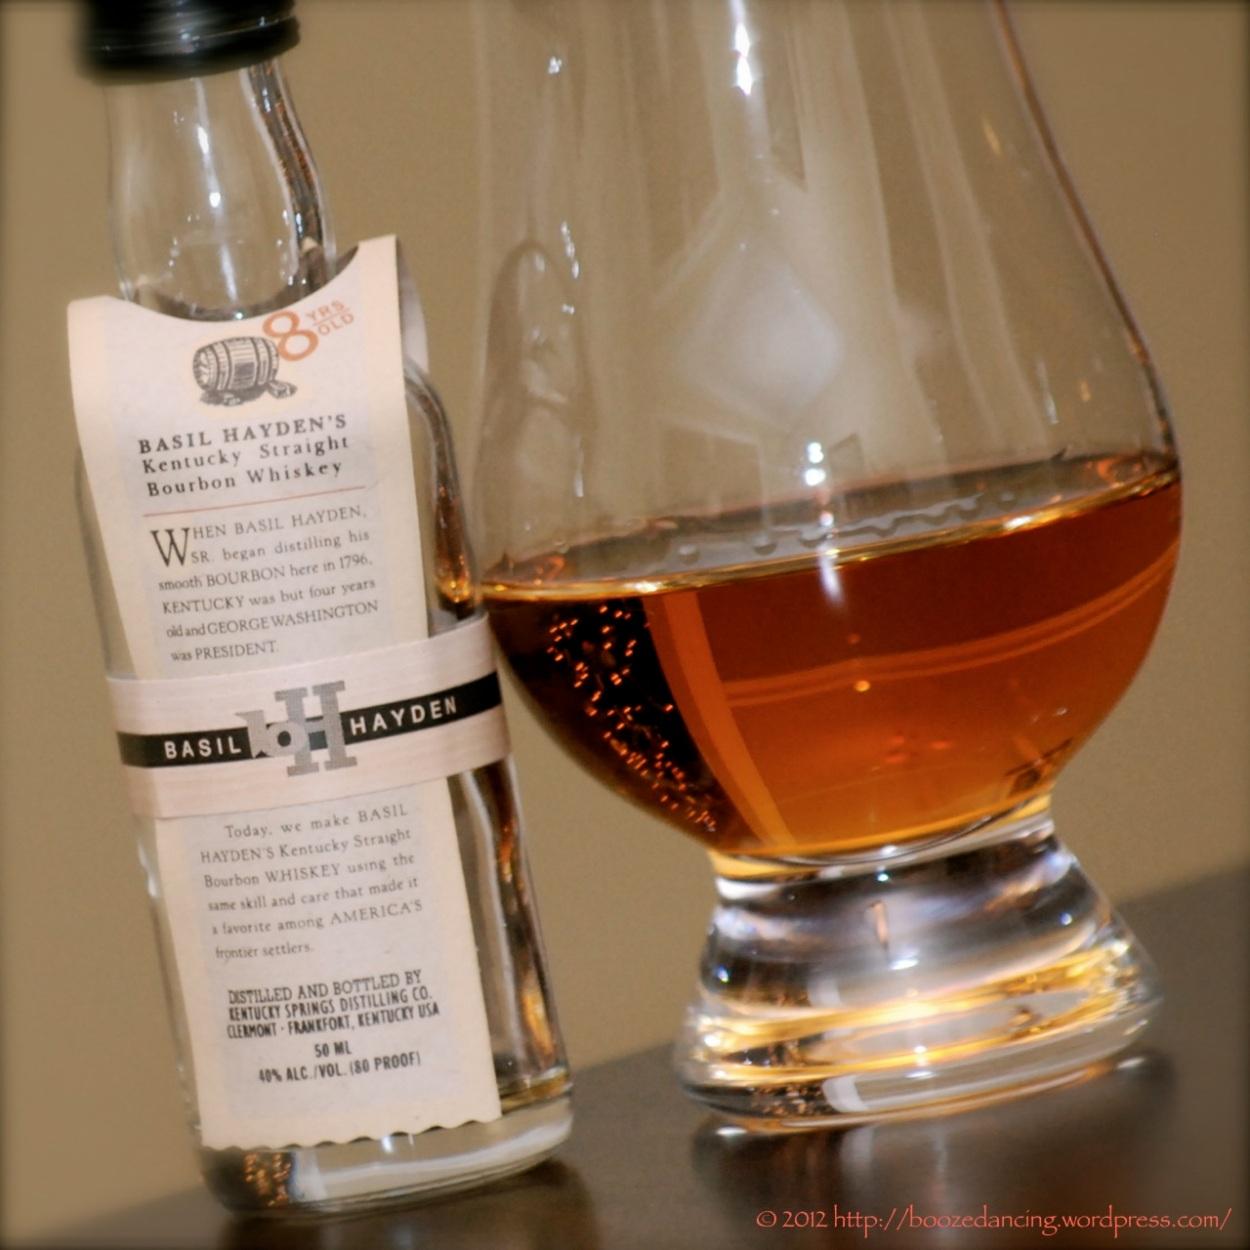 Basil Hayden 8 YO Bourbon